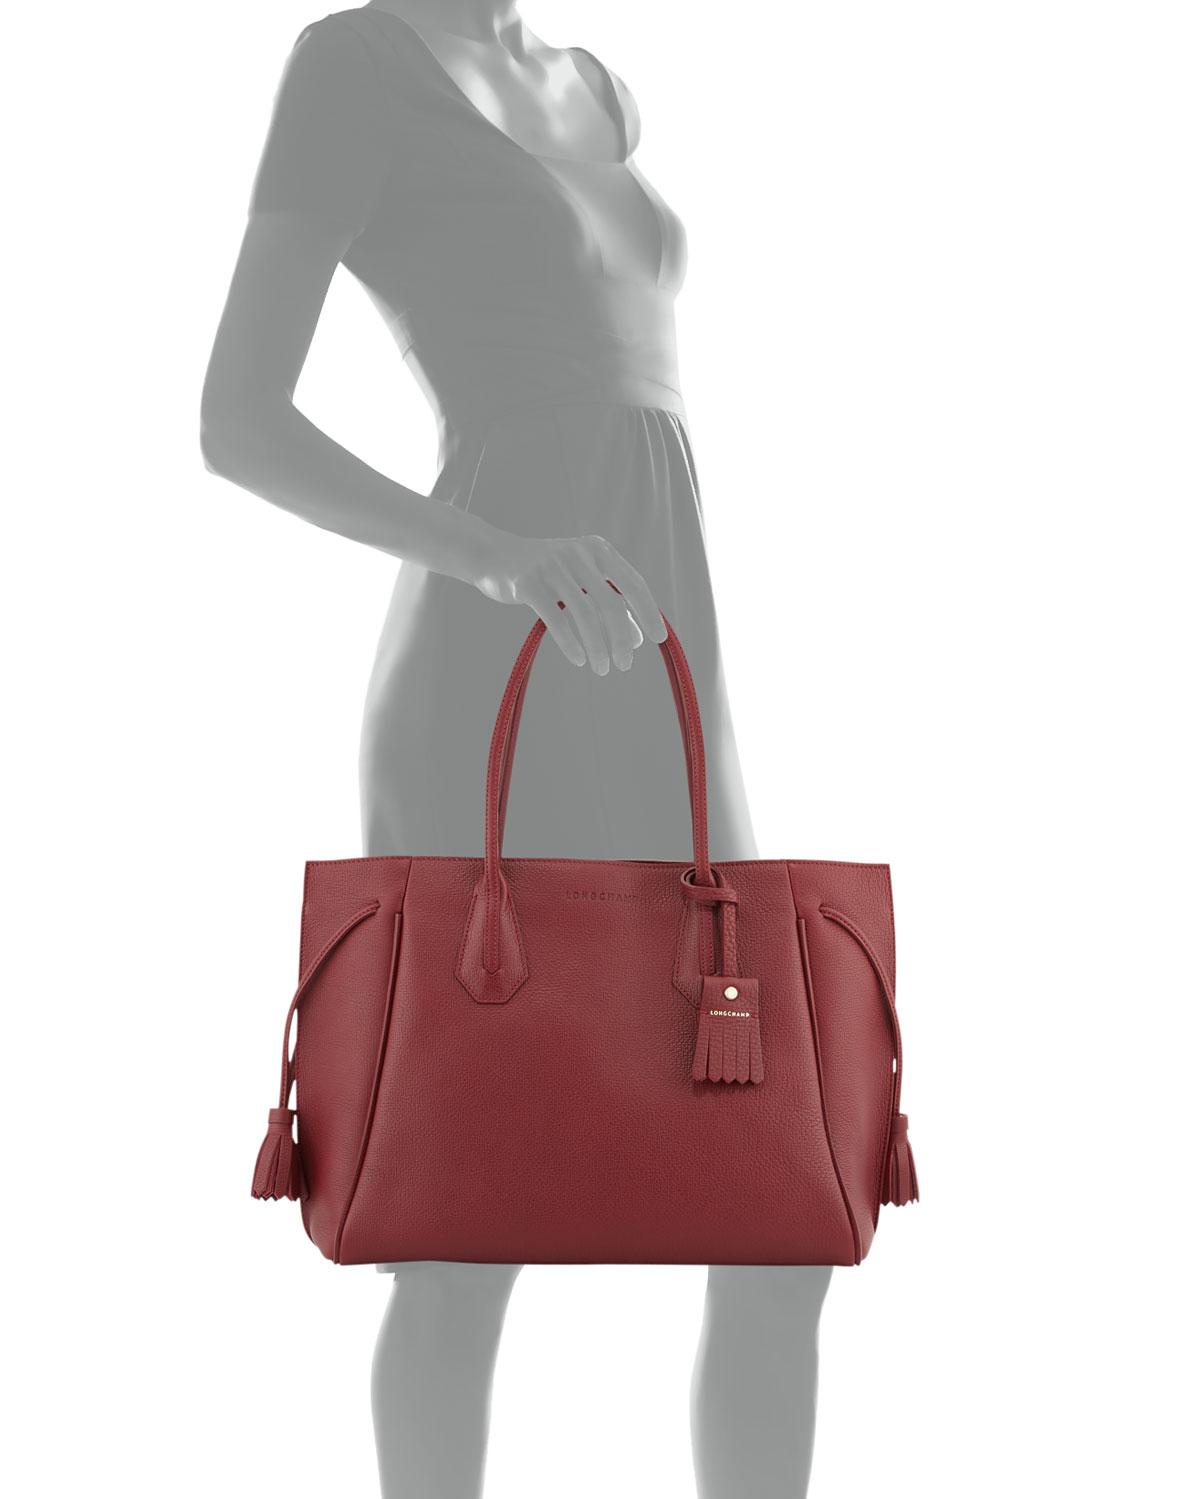 61dc8791604 Longchamp Large Leather Tote Bag.Longchamp Penelope Leather Shoulder ...